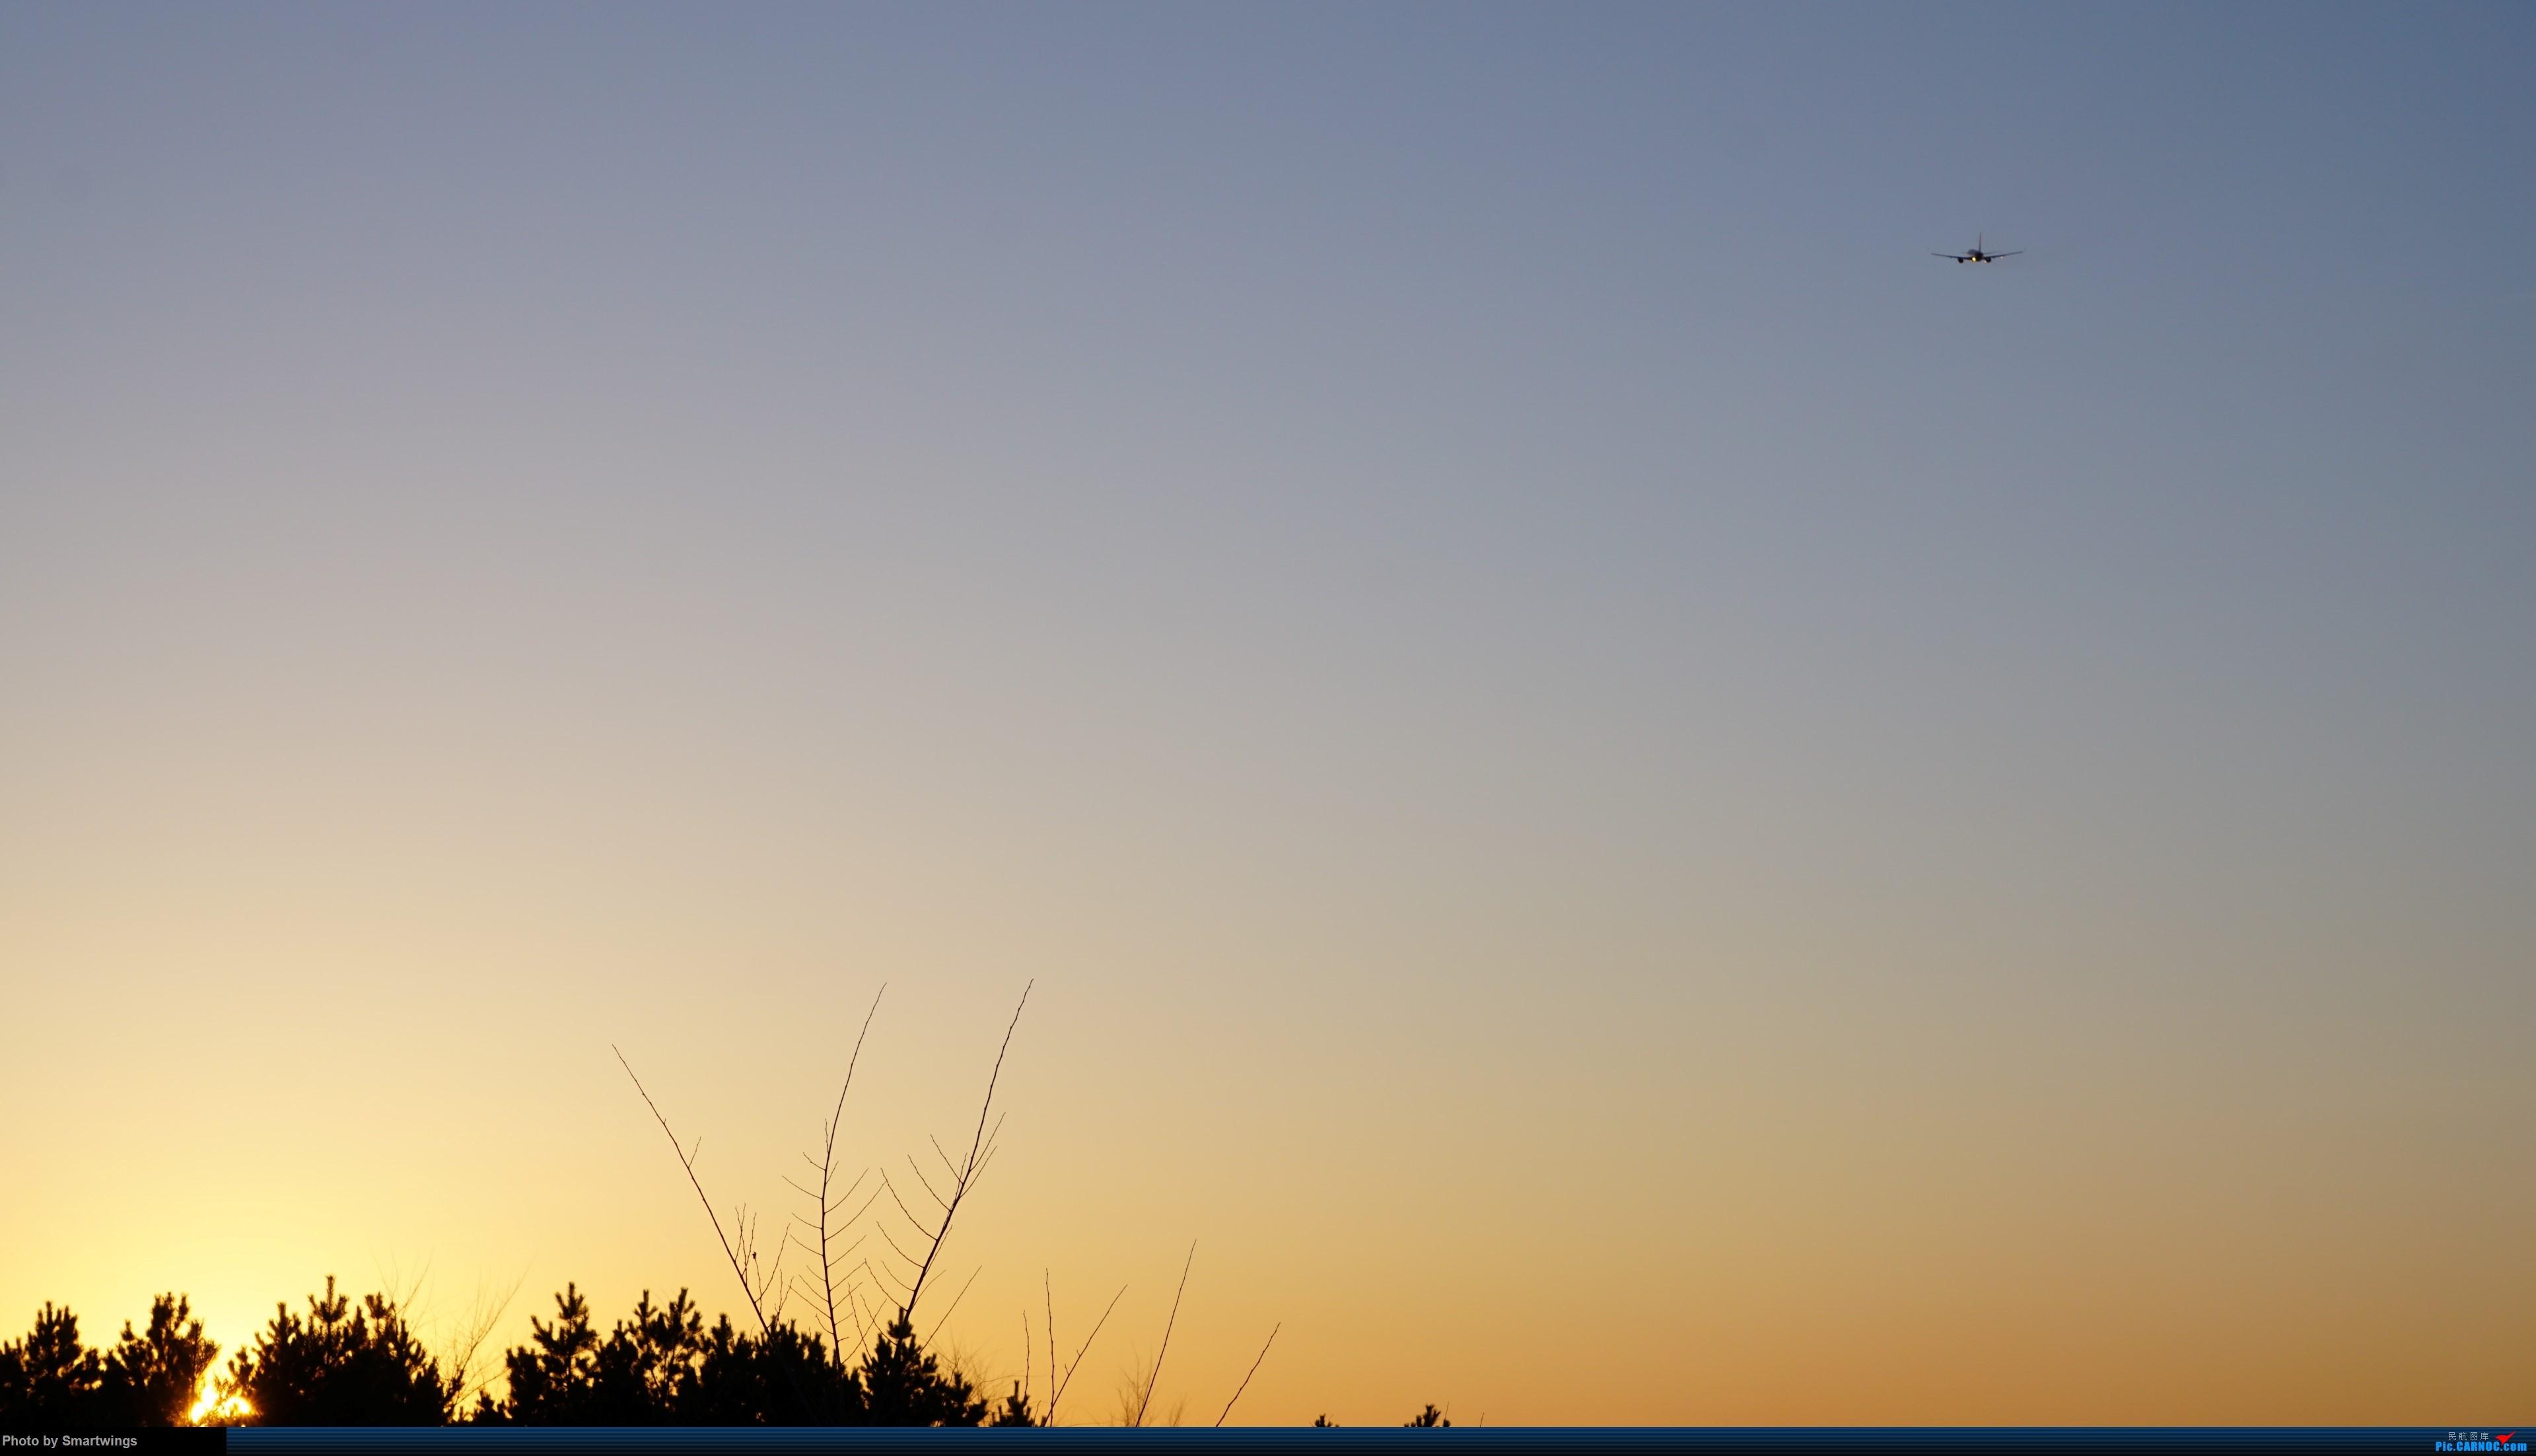 Re:[原创]呼伦贝尔机场冬日午后 BOEING 737-800 B-7633 中国海拉尔东山机场